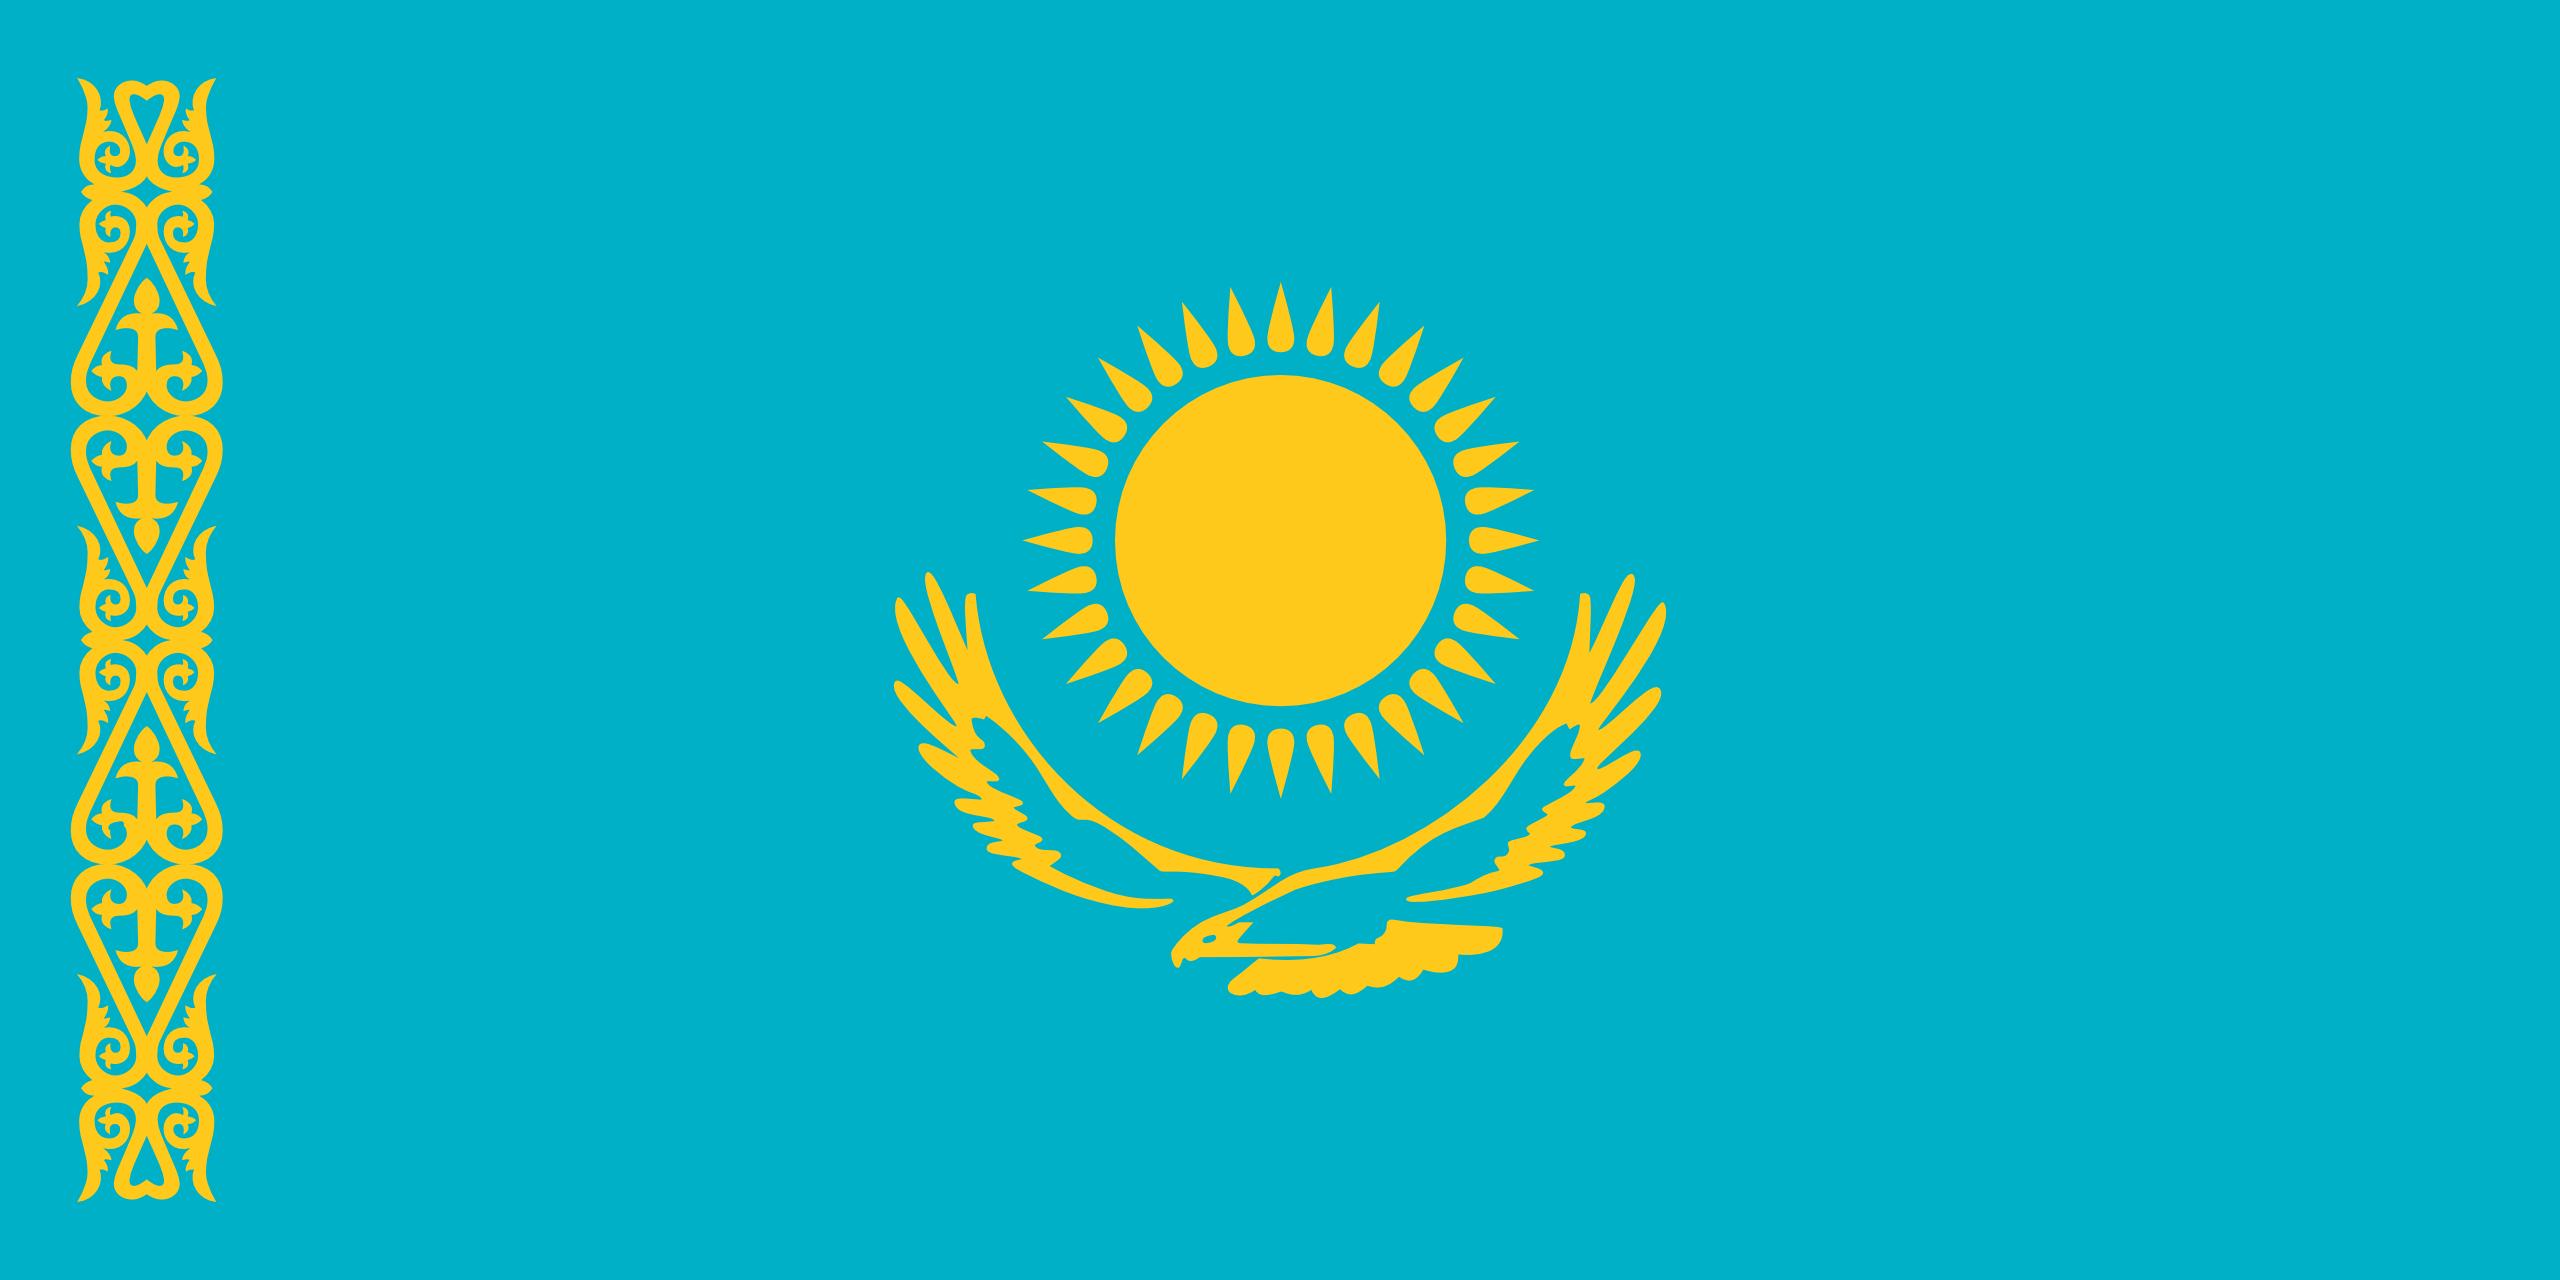 kazajistán, país, Brasão de armas, logotipo, símbolo - Papéis de parede HD - Professor-falken.com